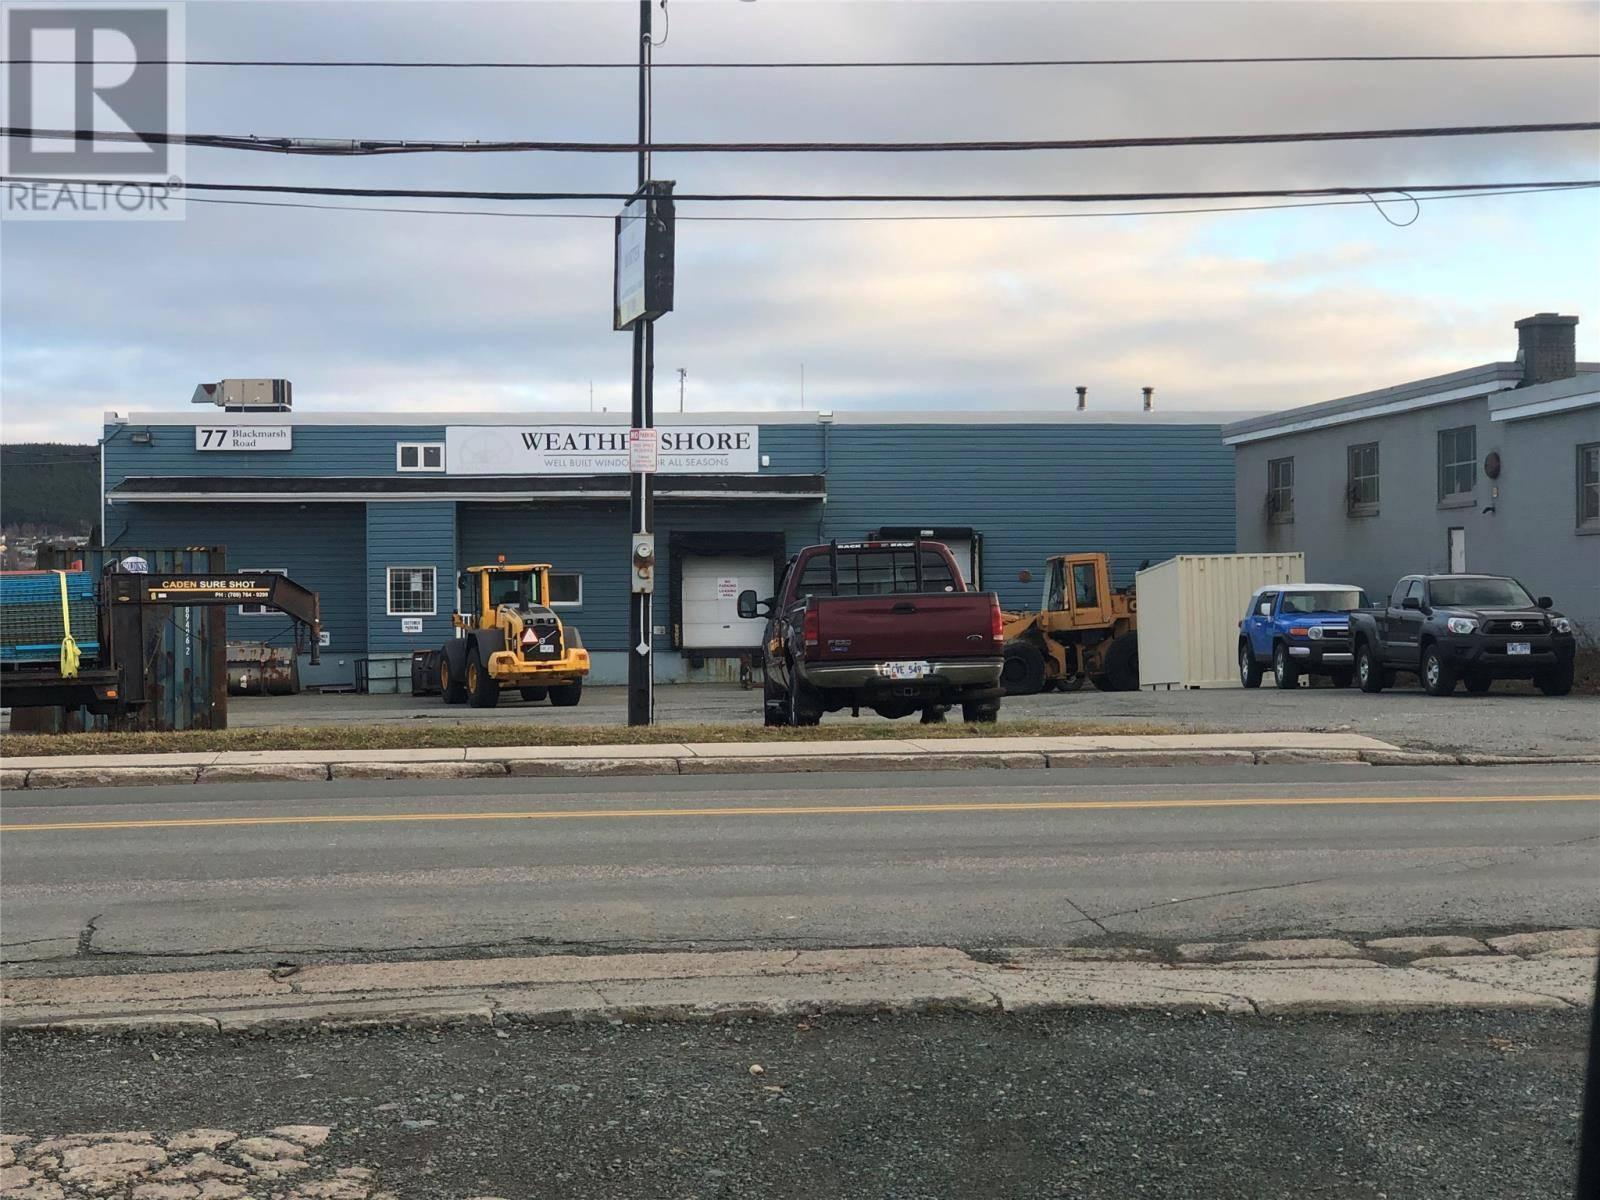 Home for sale at 77 Blackmarsh Rd St. John's Newfoundland - MLS: 1207744